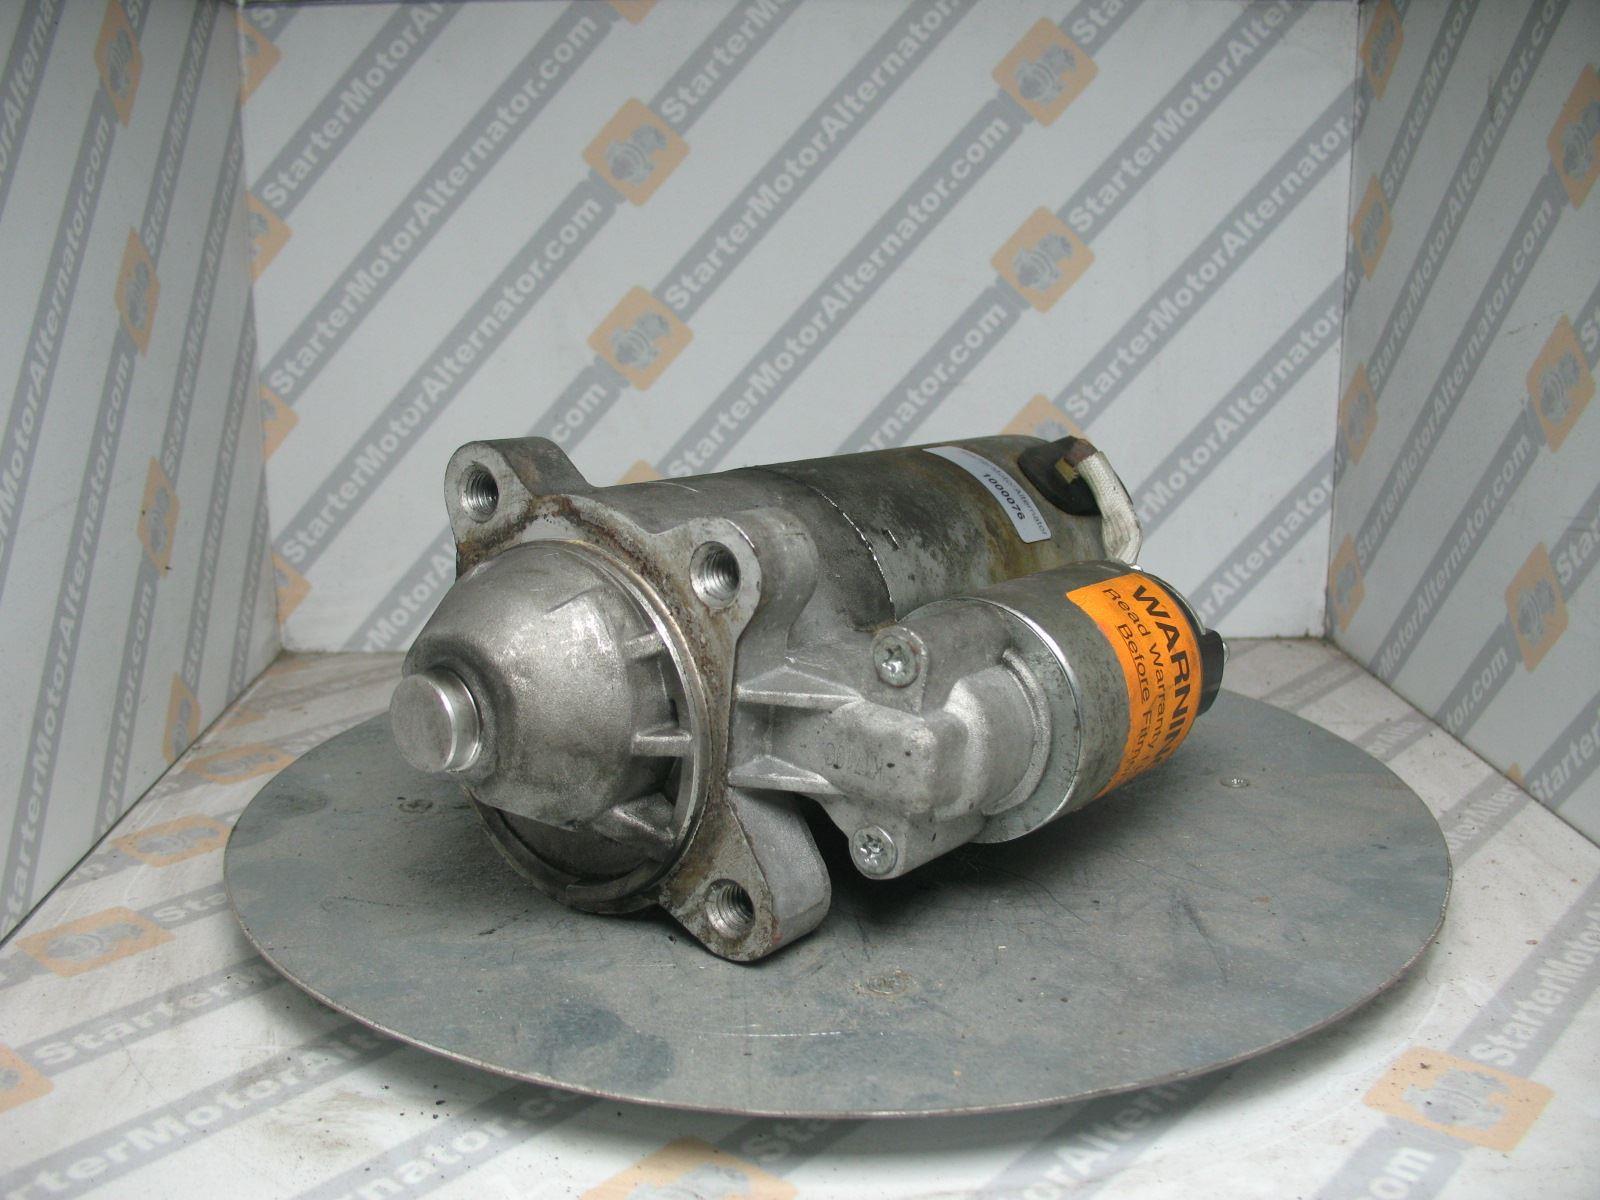 XIU1408 Starter Motor For Ford